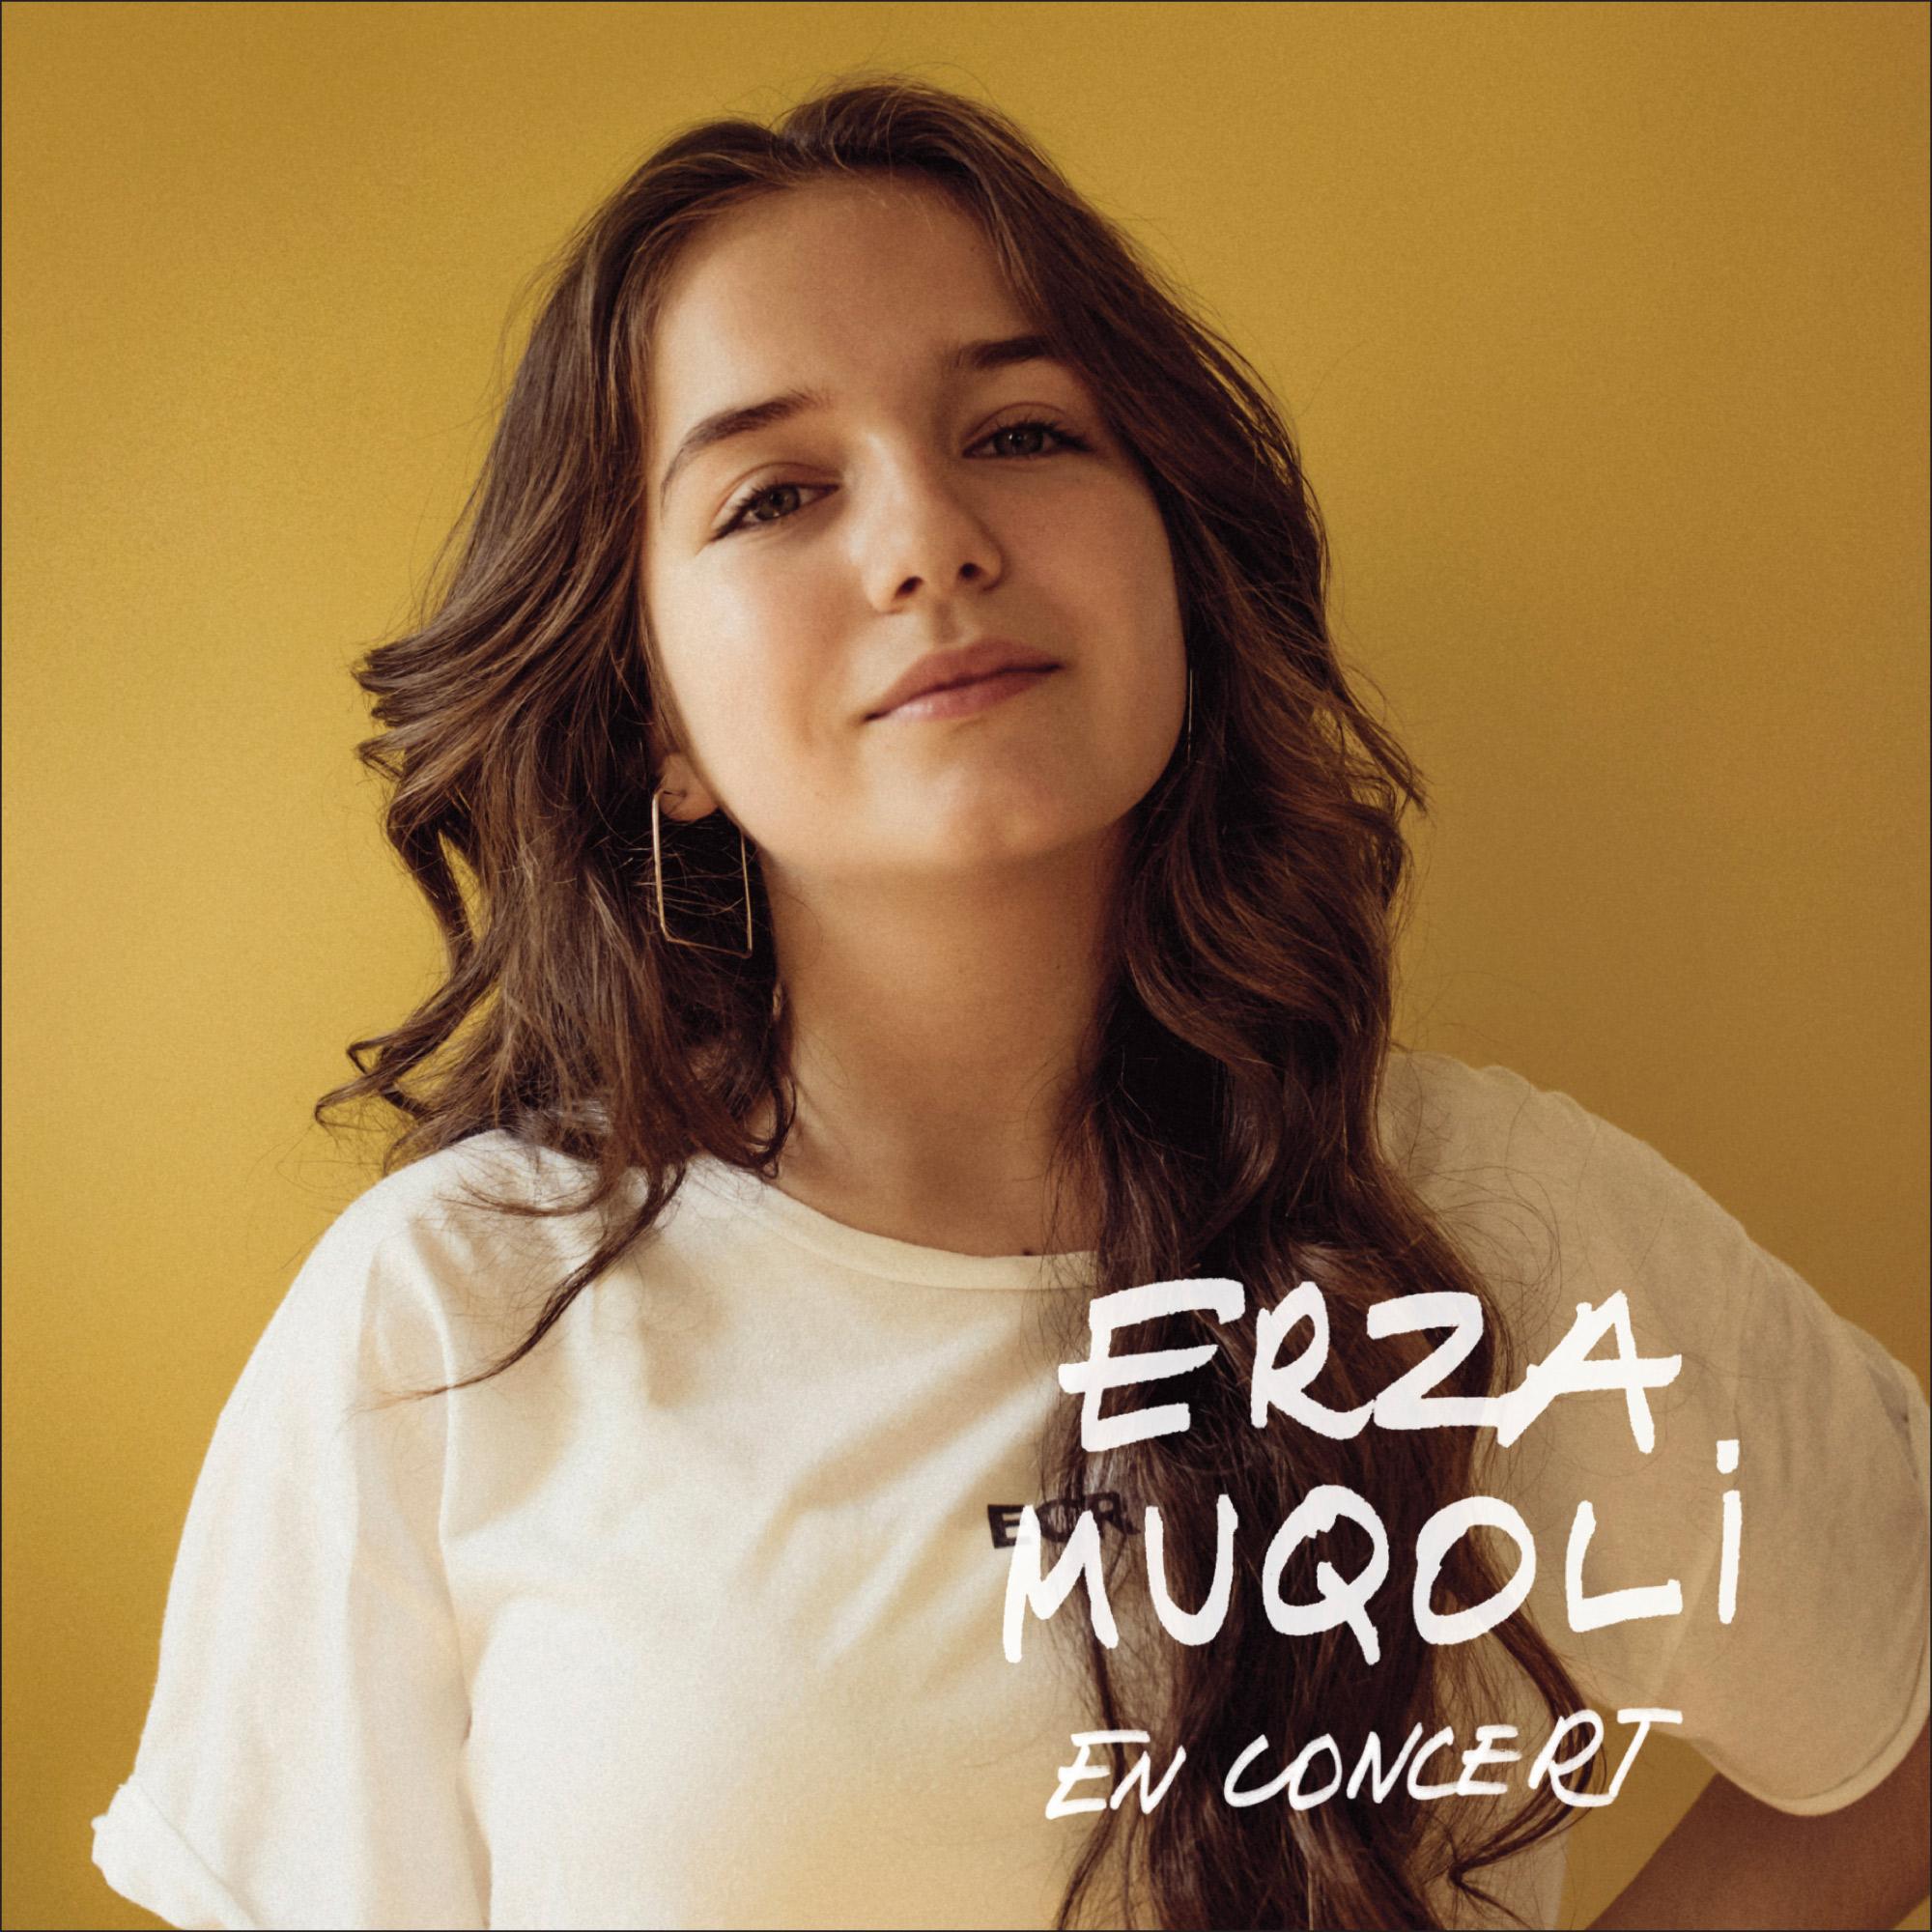 Erza Muqoli (Kids United) au Colisée